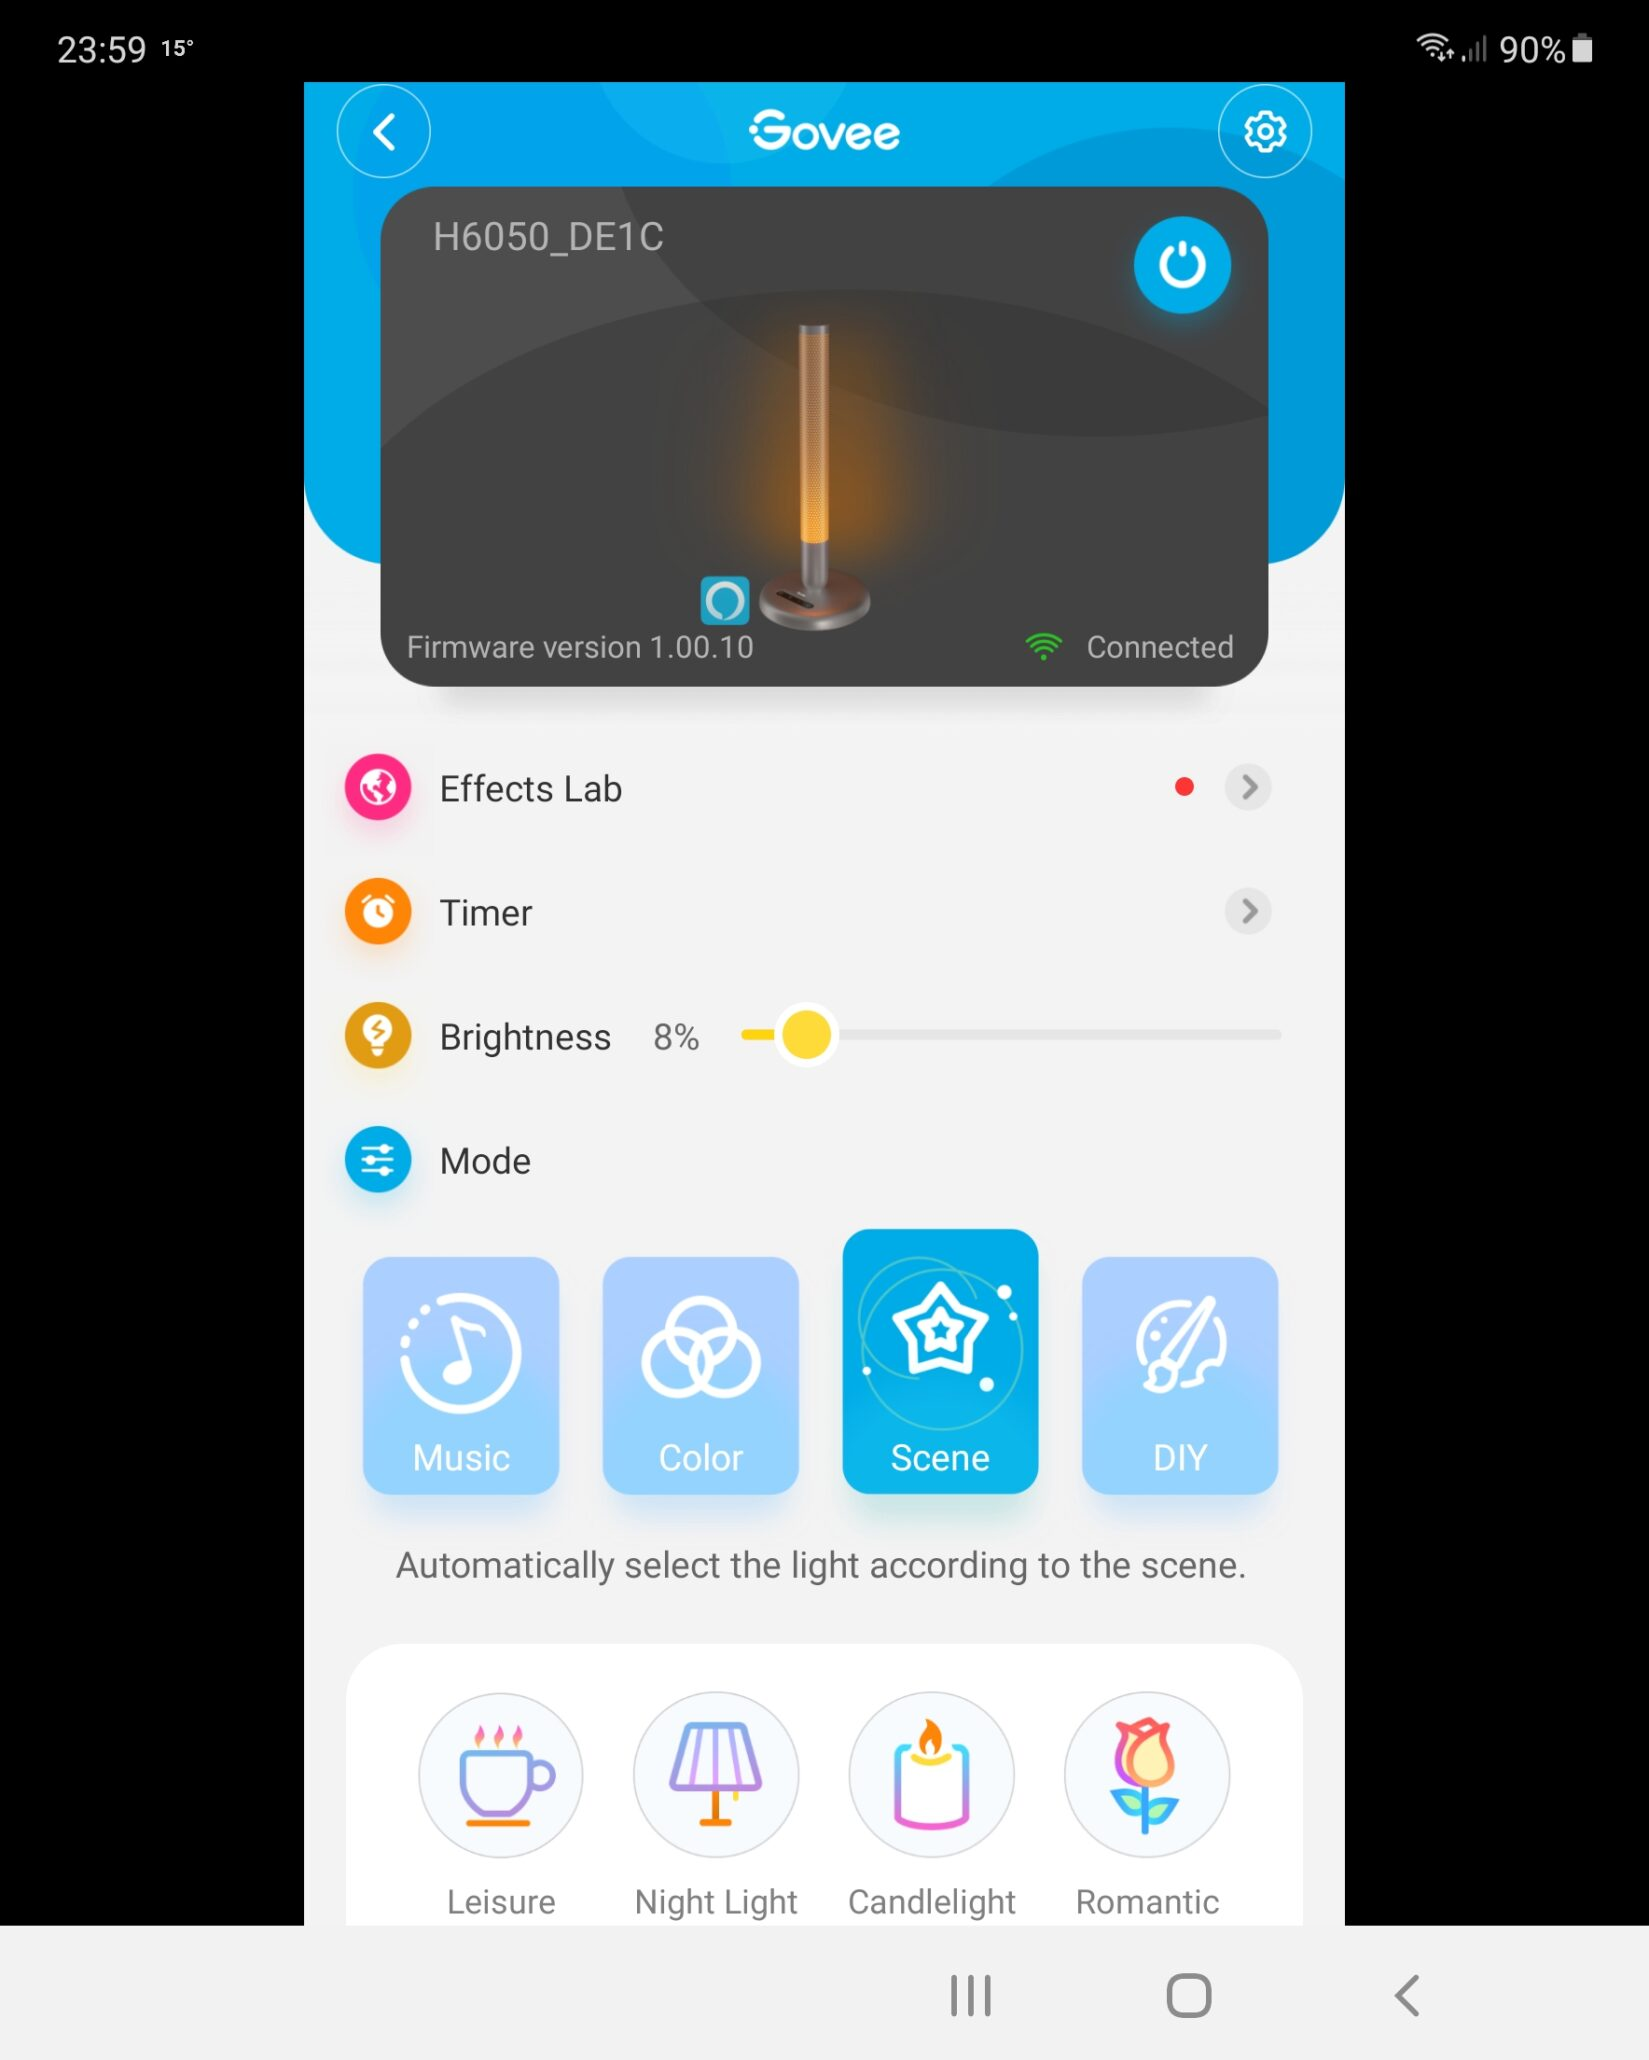 govee-glow-smart-lamp-review-03-part-3-app-2